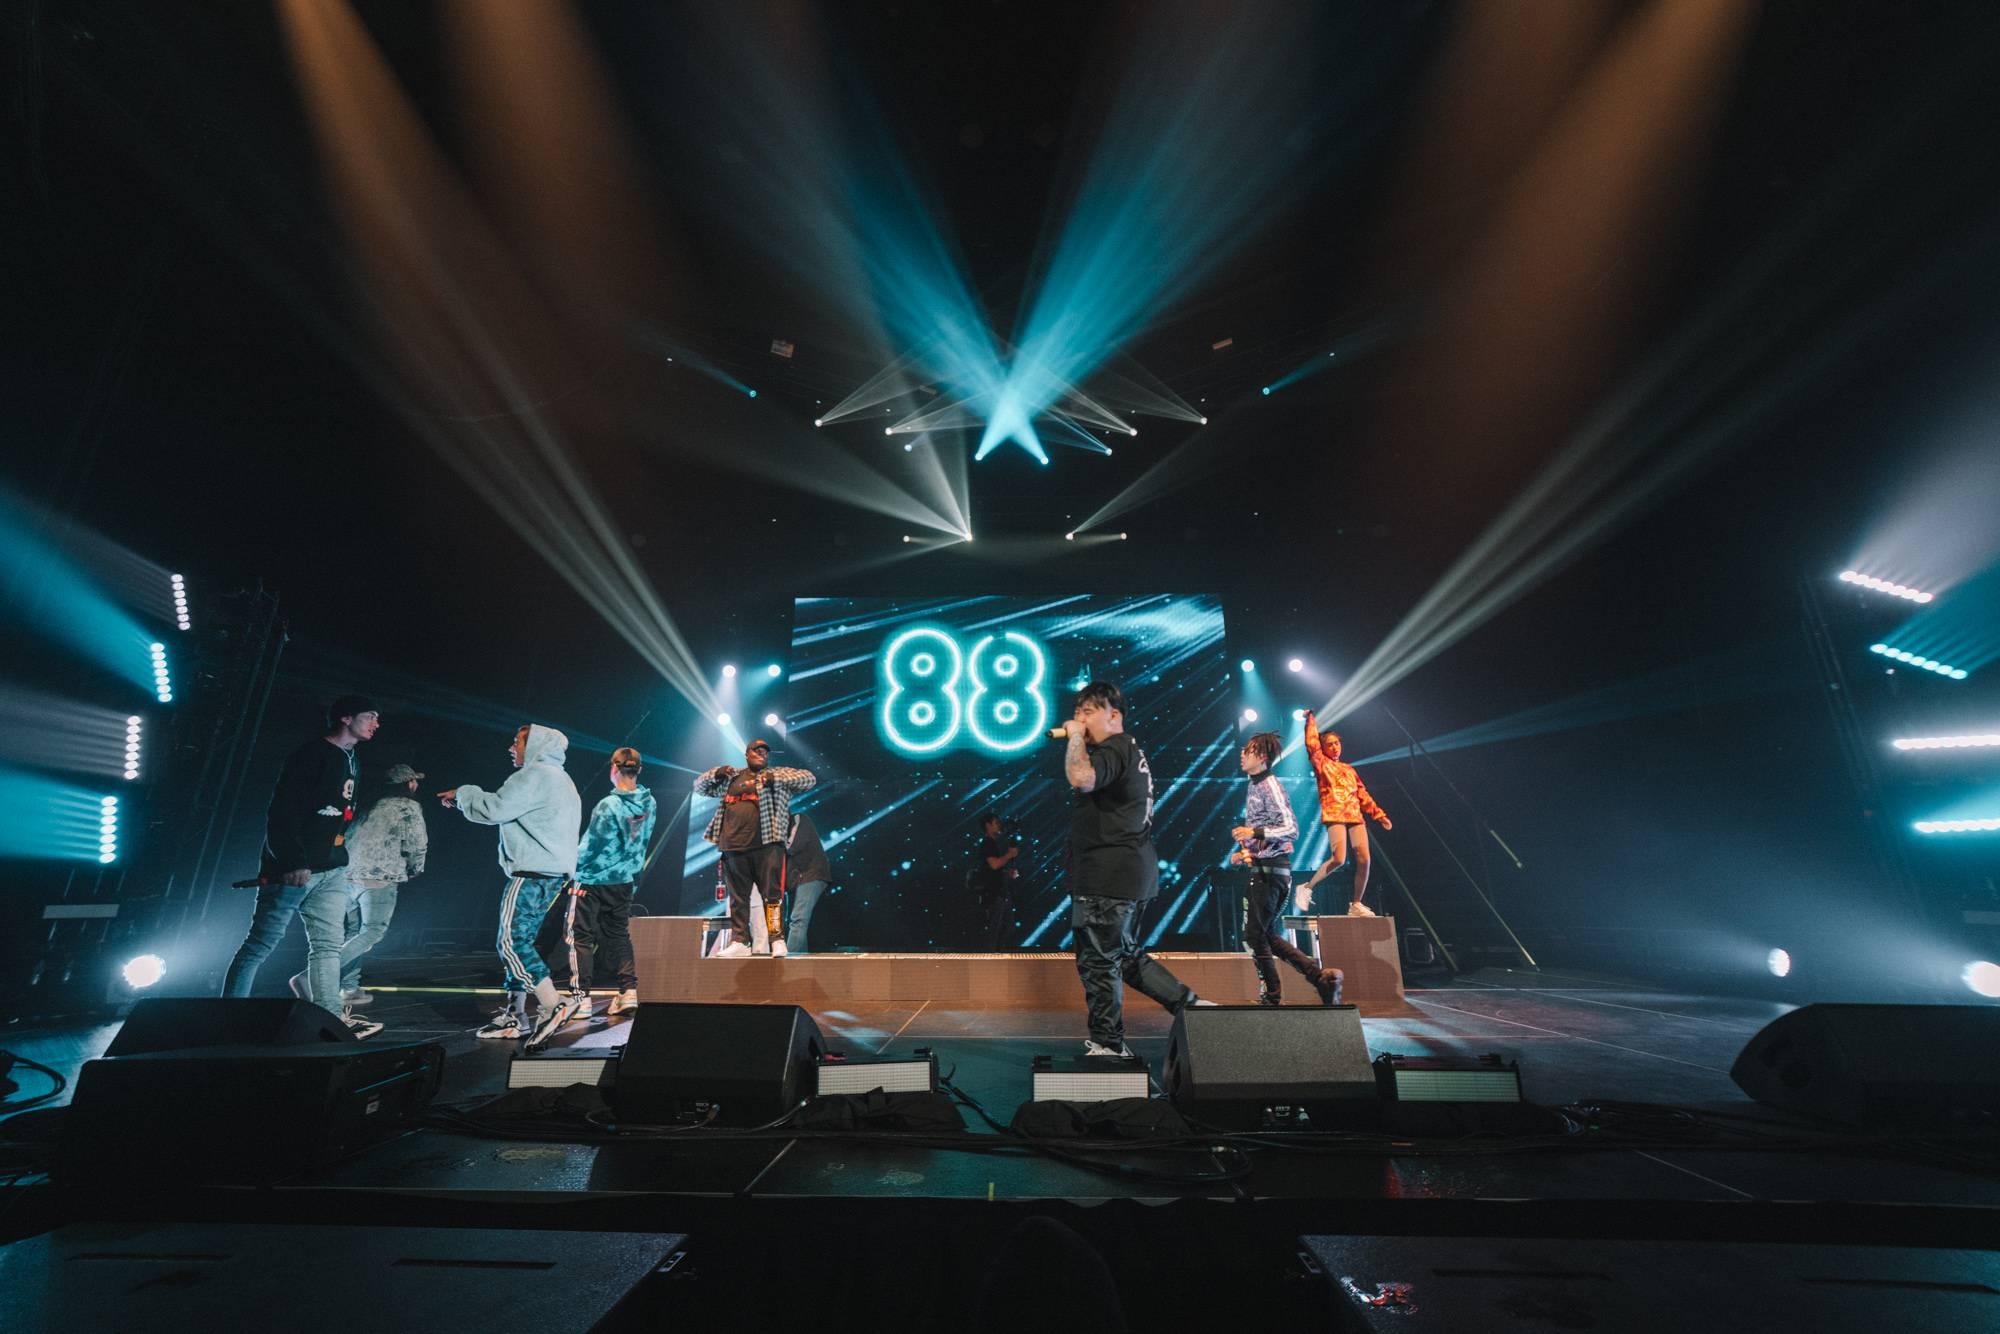 88RISING at the Pacific Coliseum, Vancouver, Oct 26 2018. Noah Shumka photo.